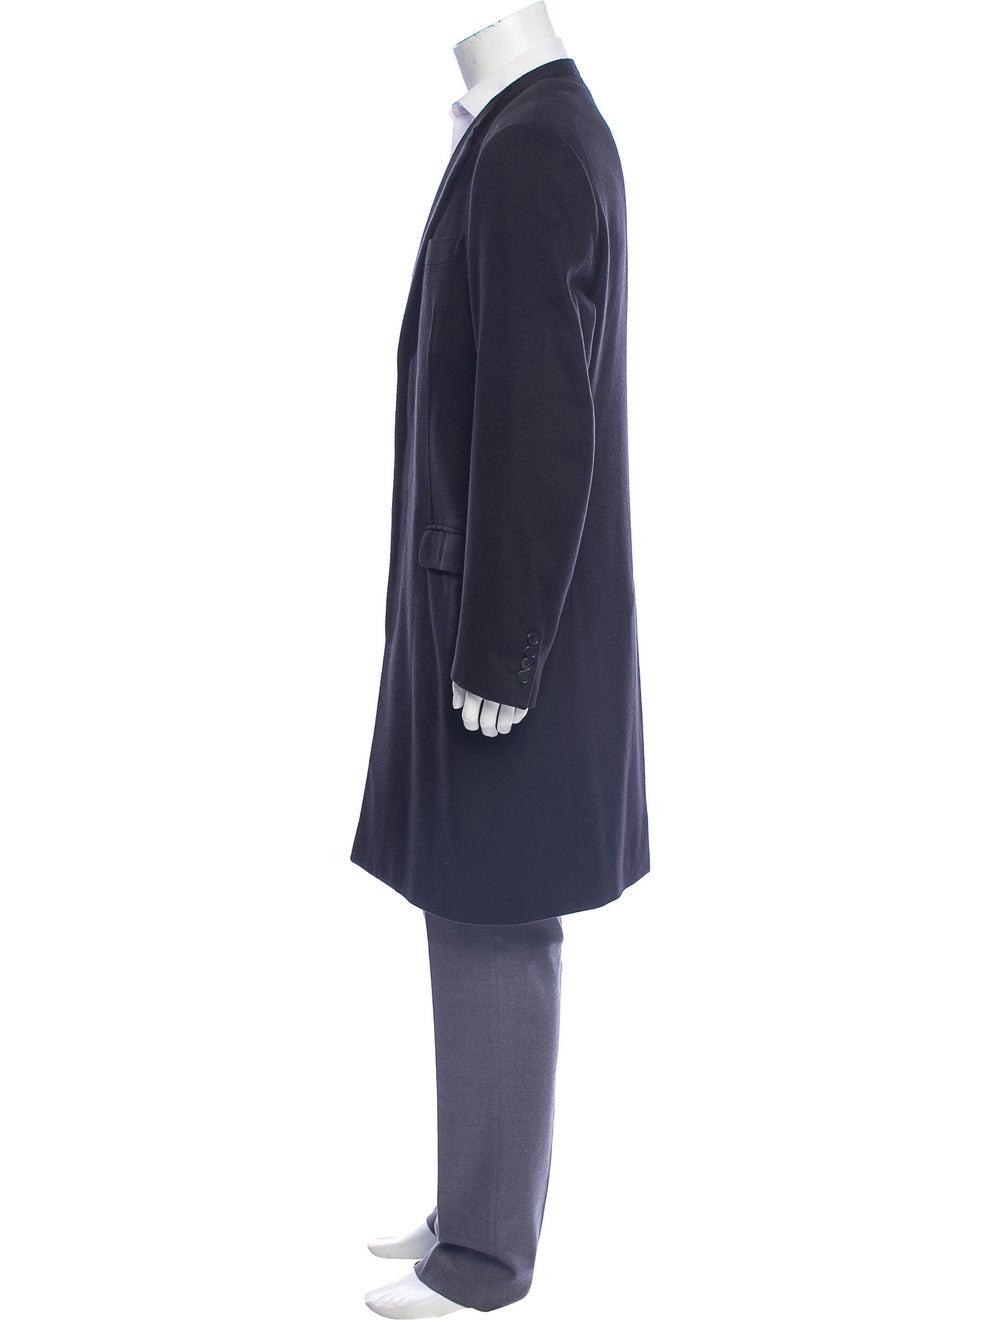 Lanvin Wool-Blend Overcoat black - image 2